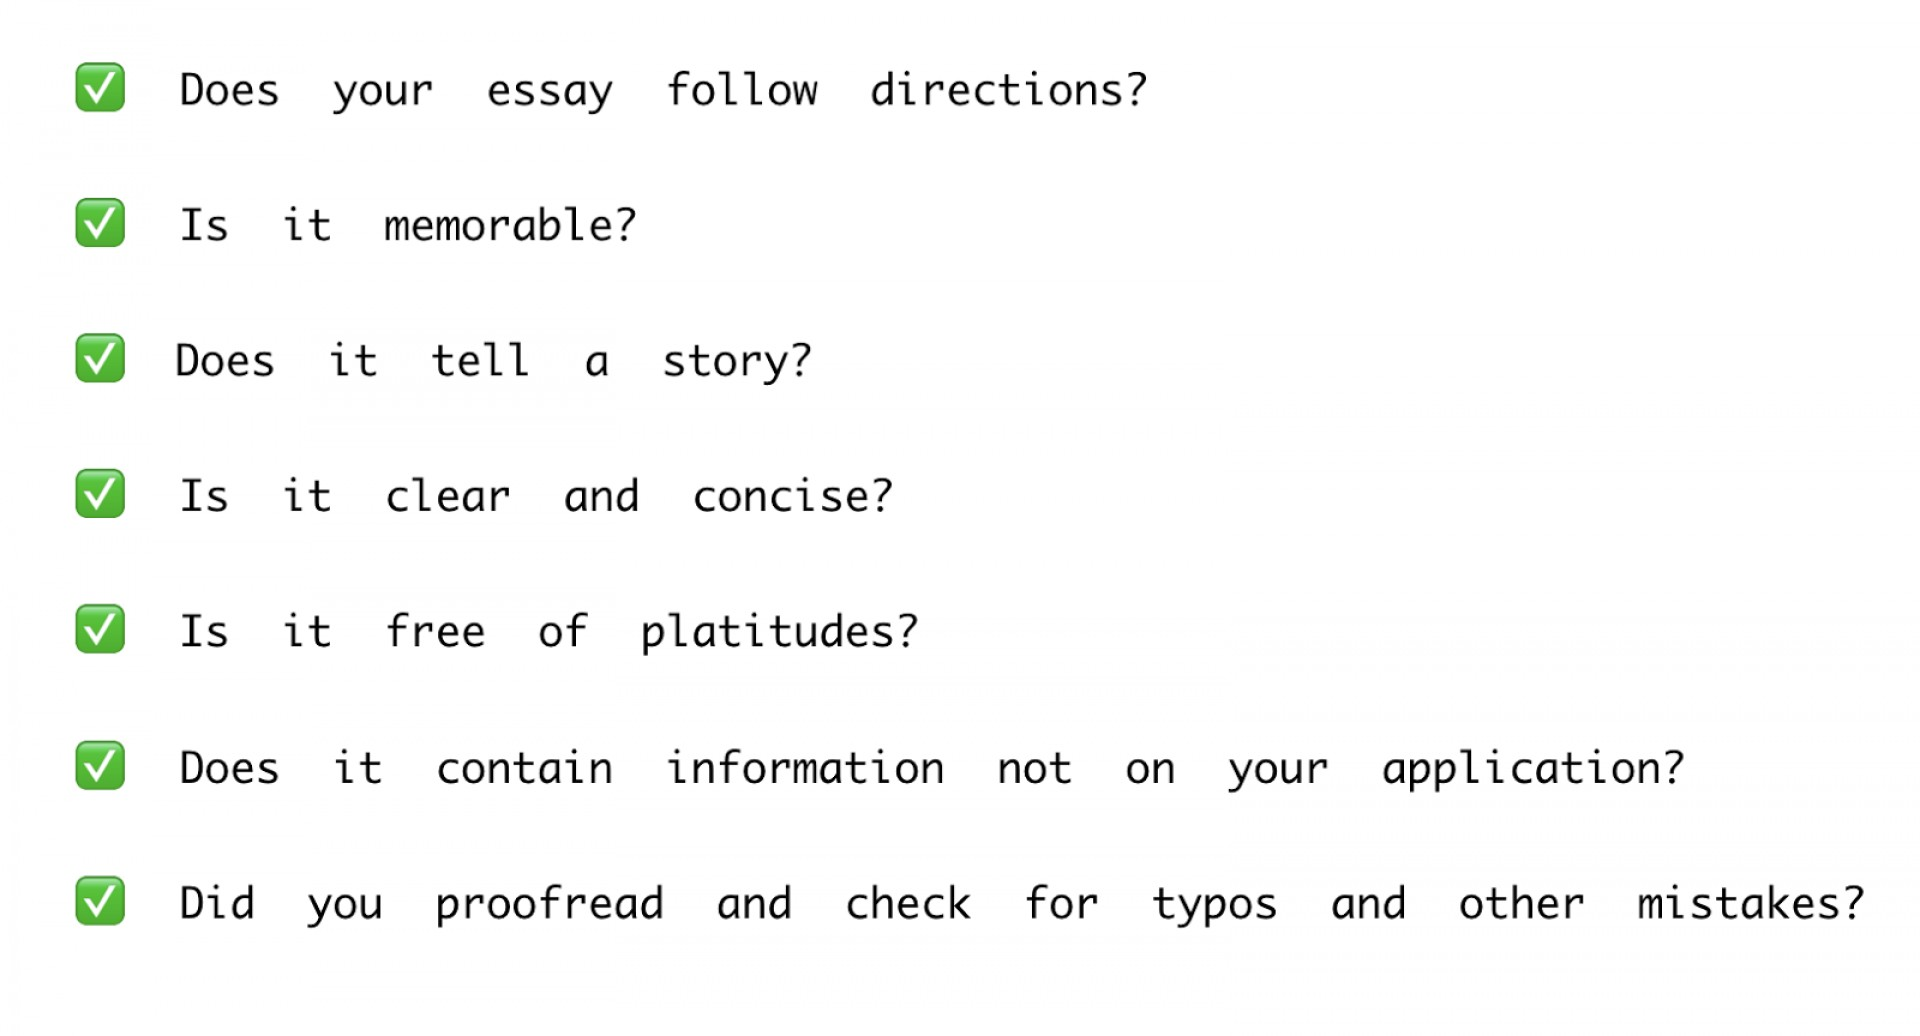 005 84342c807cd6 Pasted20image200 Essay Example Scholarship Singular Tips Rotc Psc Reddit 1920